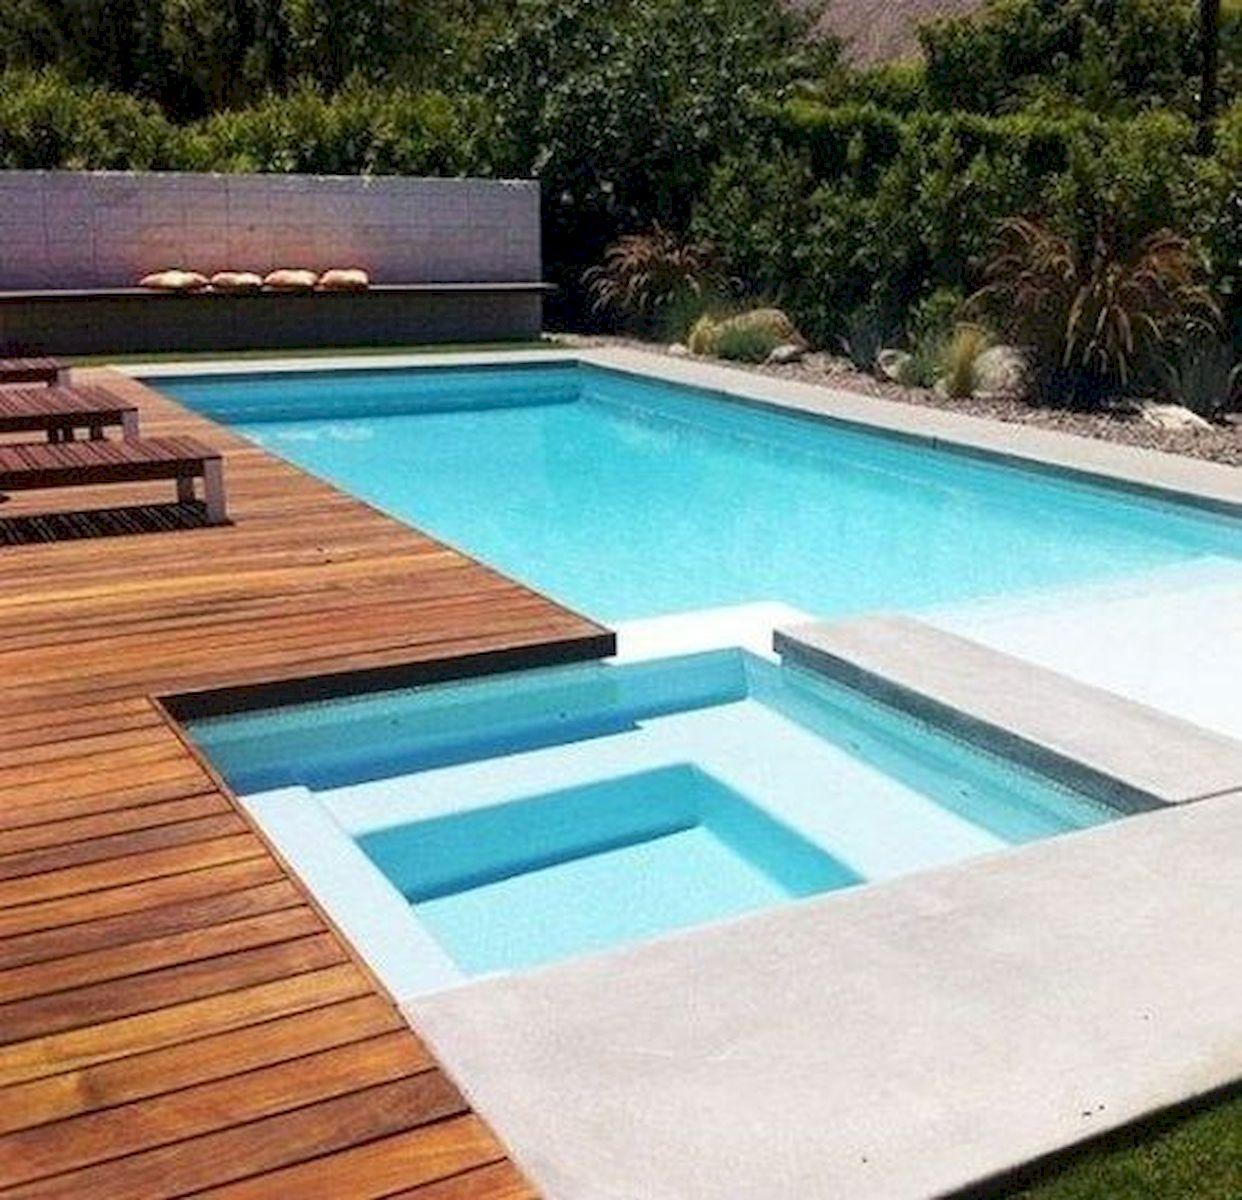 46 Fantastic Modern Swimming Pool Design Ideas (17)